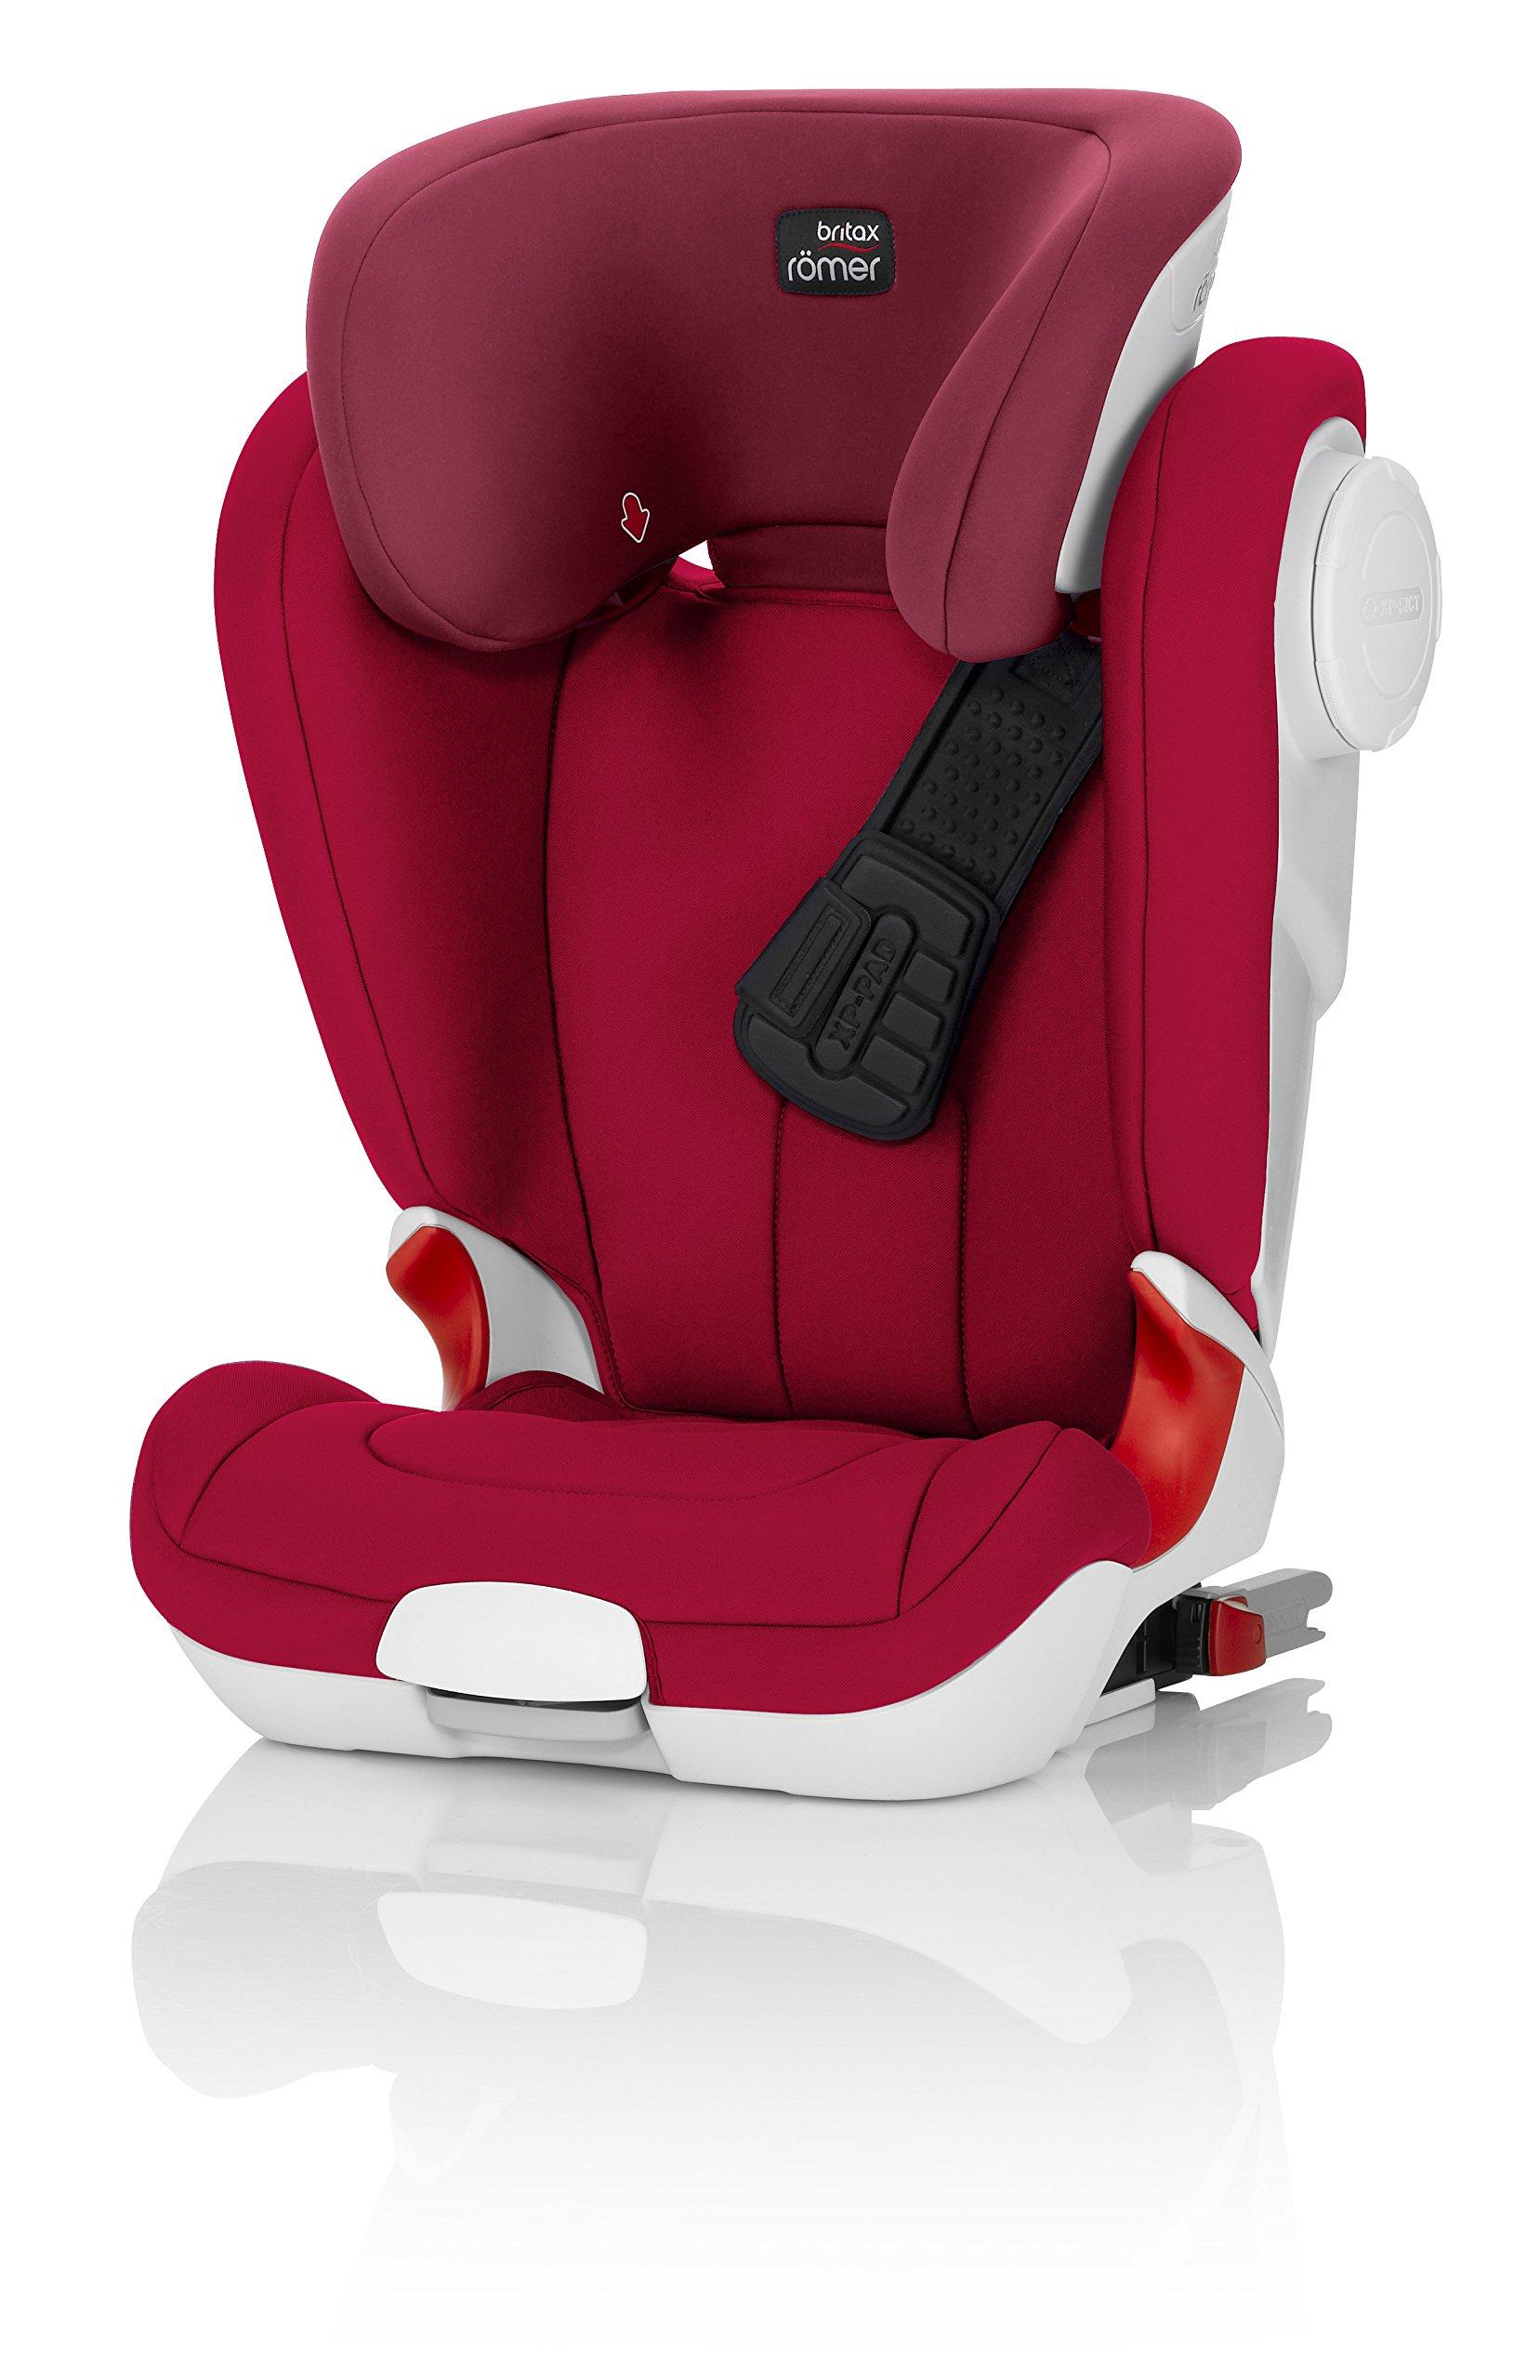 britax r mer kindersitz 15 36 kg autositz gruppe 2 3 kidfix xp sict flame red best puls. Black Bedroom Furniture Sets. Home Design Ideas